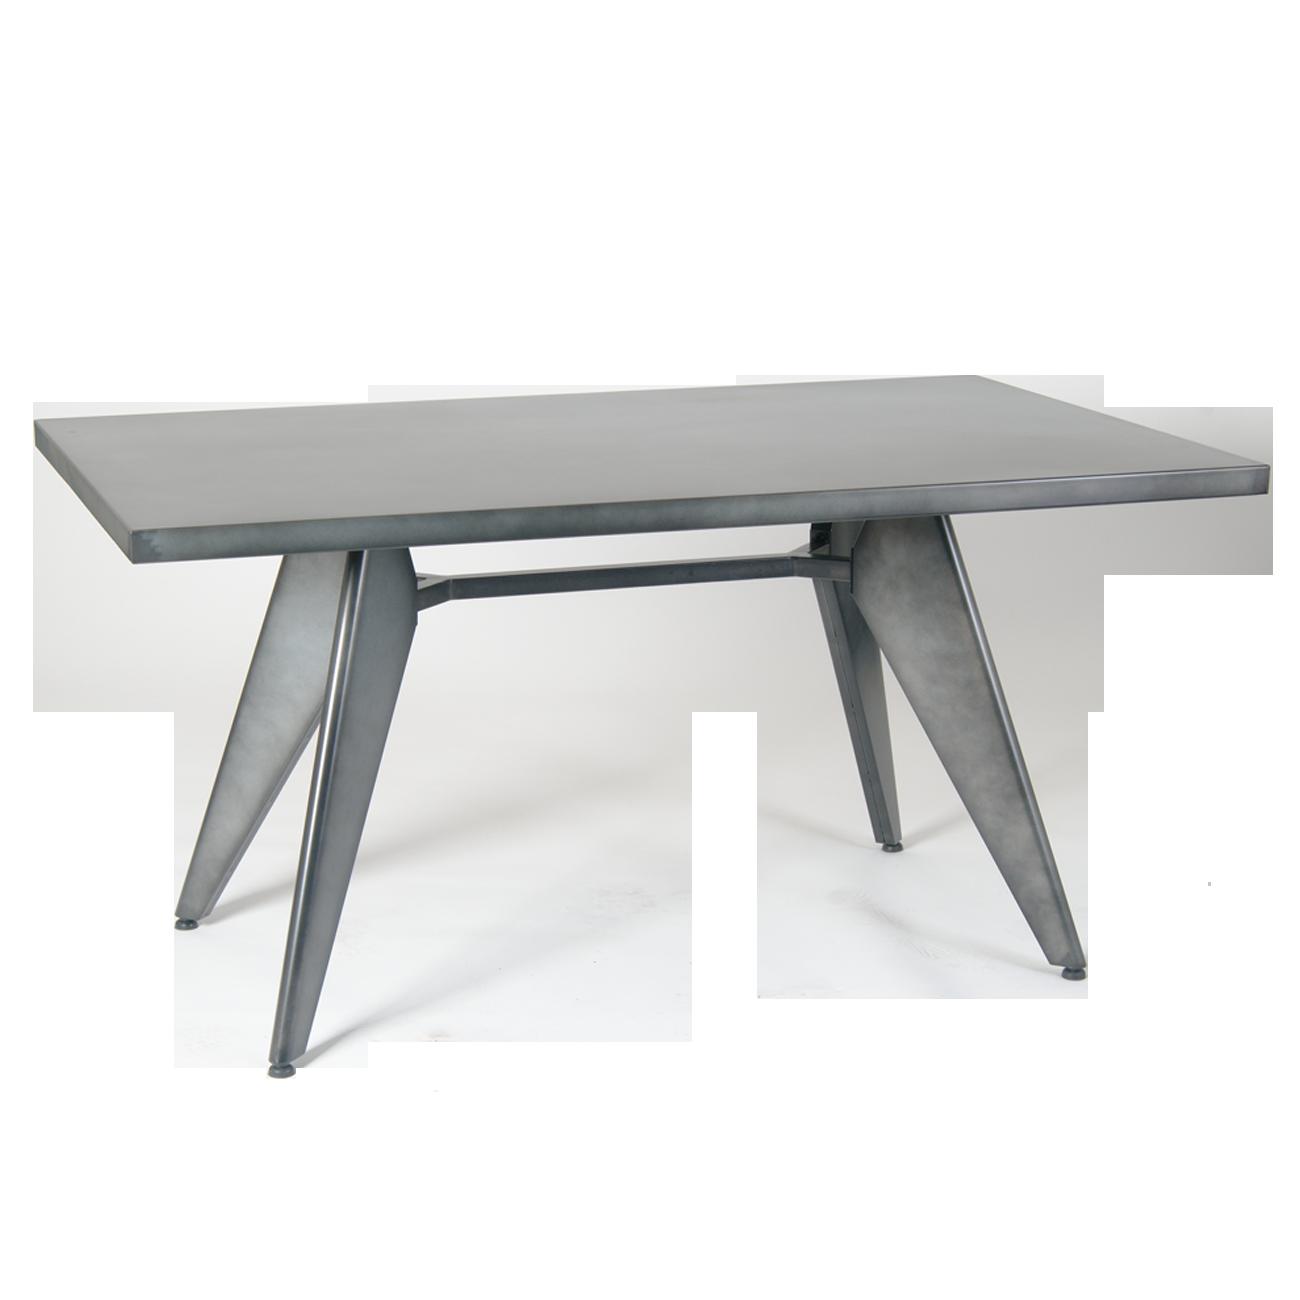 Galvanized Patio Furniture.36 X 60 Galvanized Steel Table In Cement Color Restaurant